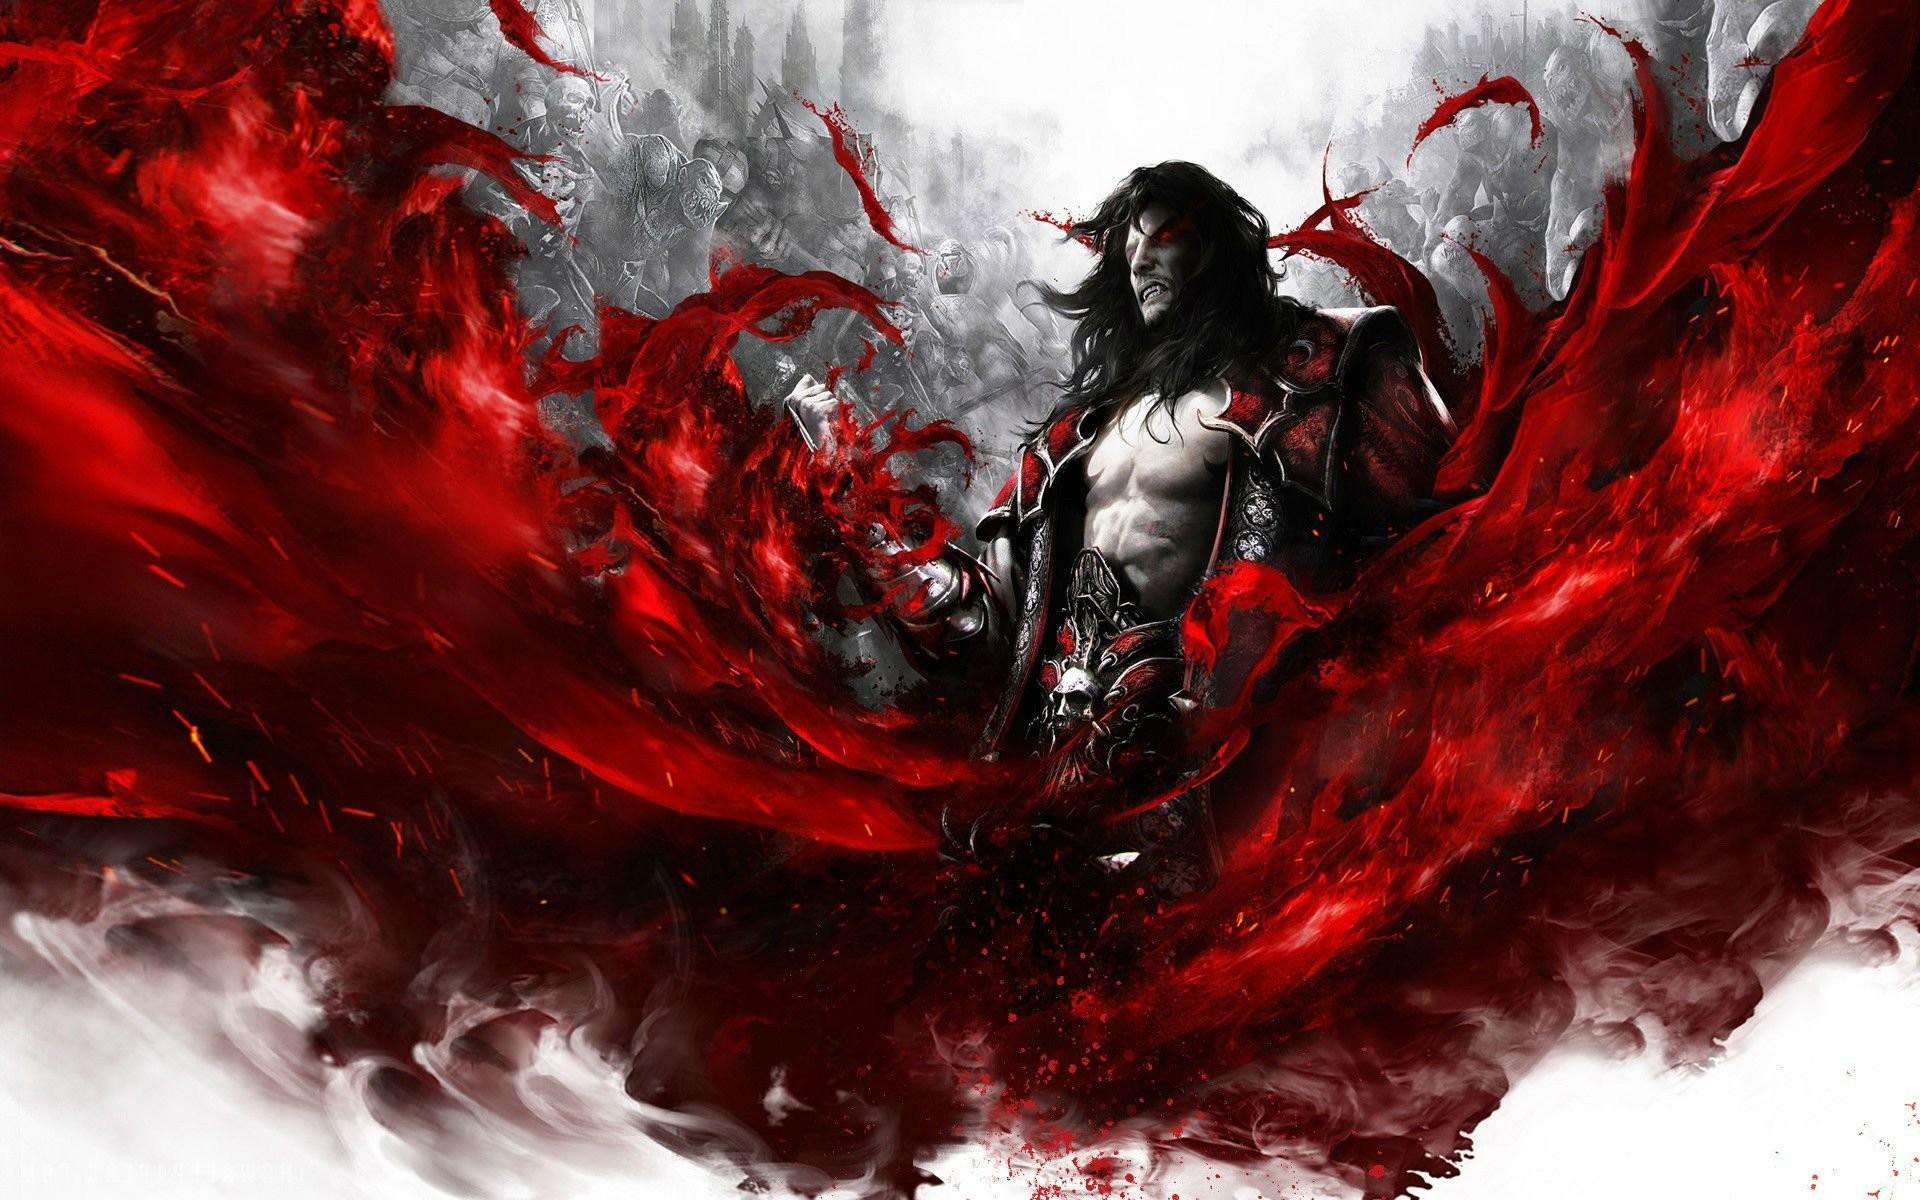 Res: 1920x1200, castlevania, Fantasy, Dark, Vampire, Dracula, Adventure, Action, Platform,  Warrior Wallpapers HD / Desktop and Mobile Backgrounds